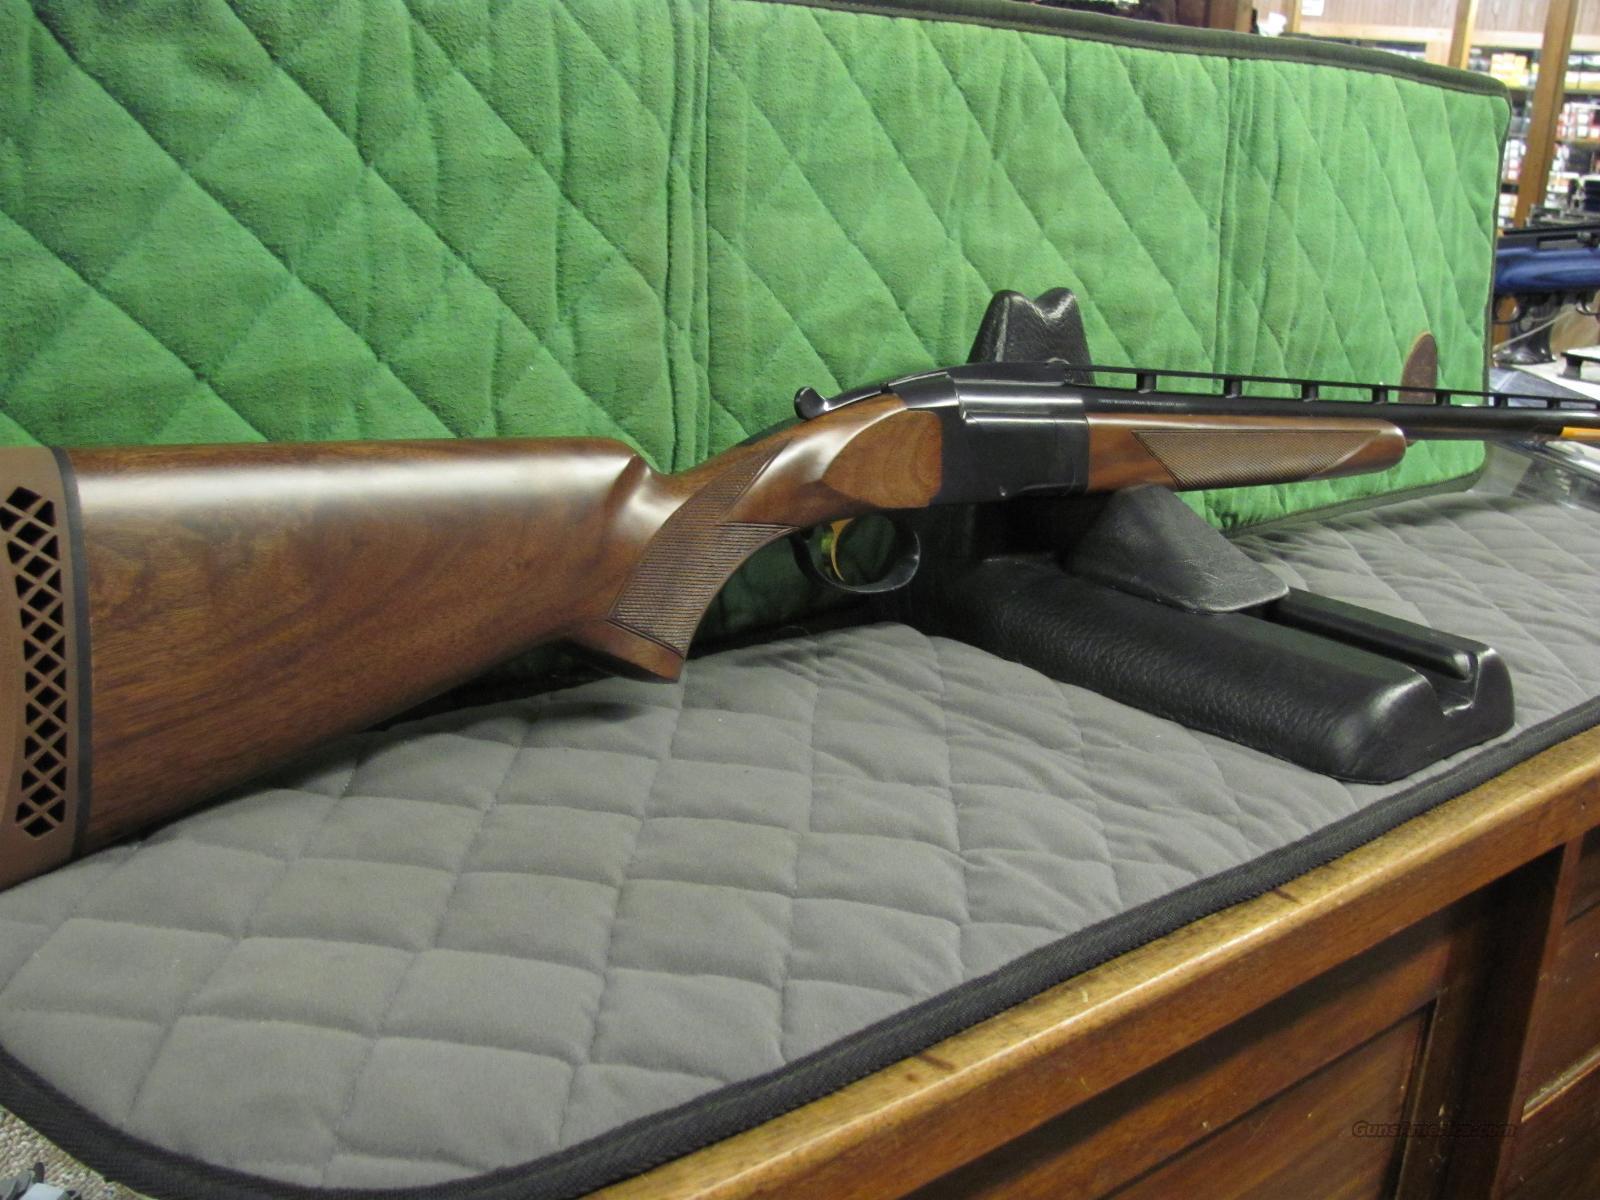 Browning BT-99 Micro Midas 28 Inch  **NEW**  Guns > Shotguns > Browning Shotguns > Single Barrel